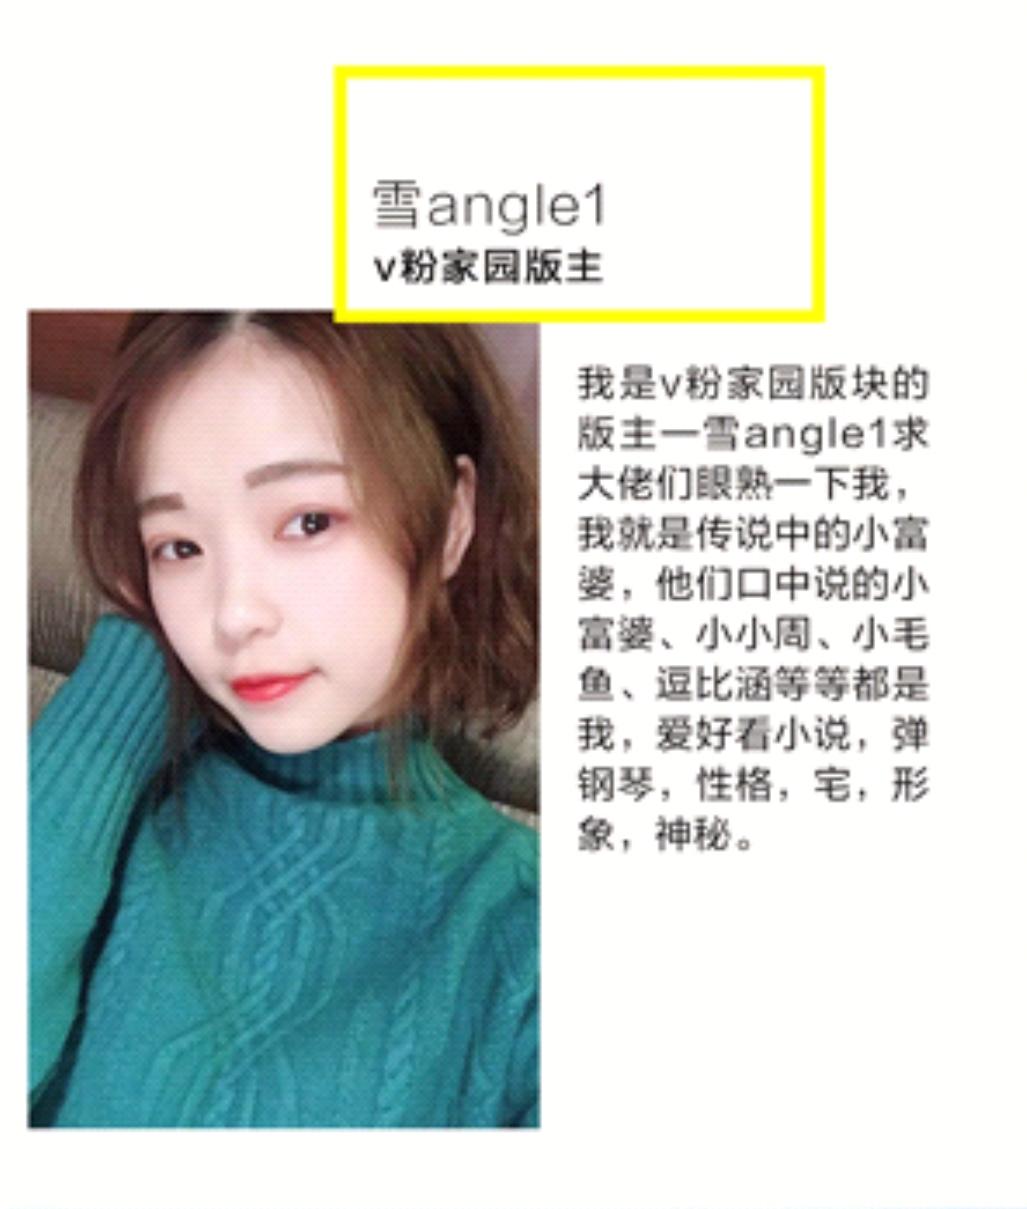 Screenshot_2019_0122_222940.png